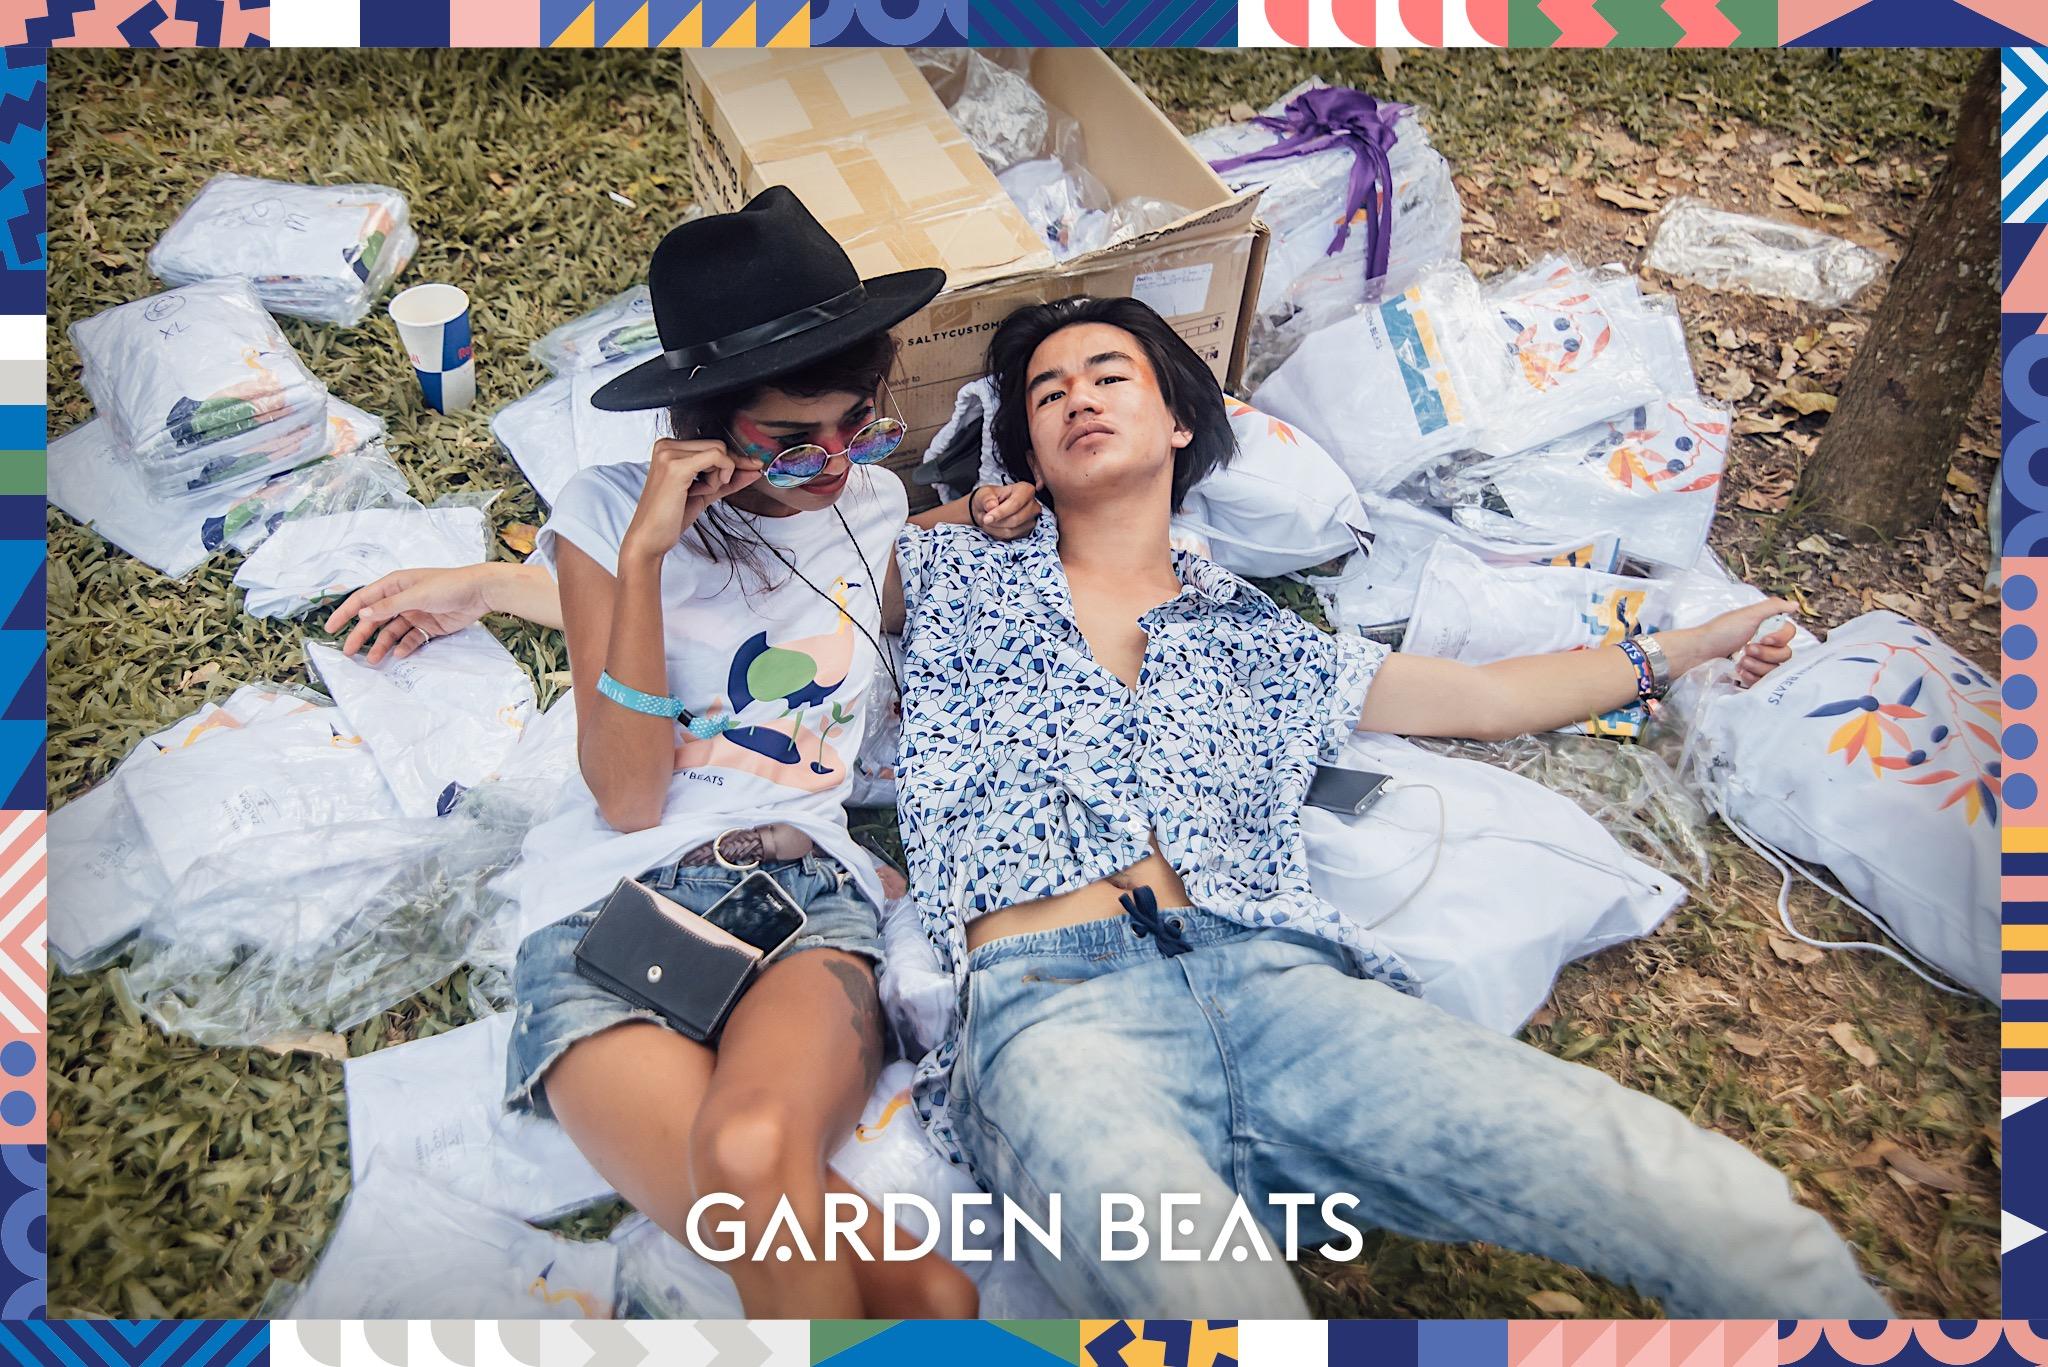 18032017_GardenBeats_Colossal663_WatermarkedGB.jpg